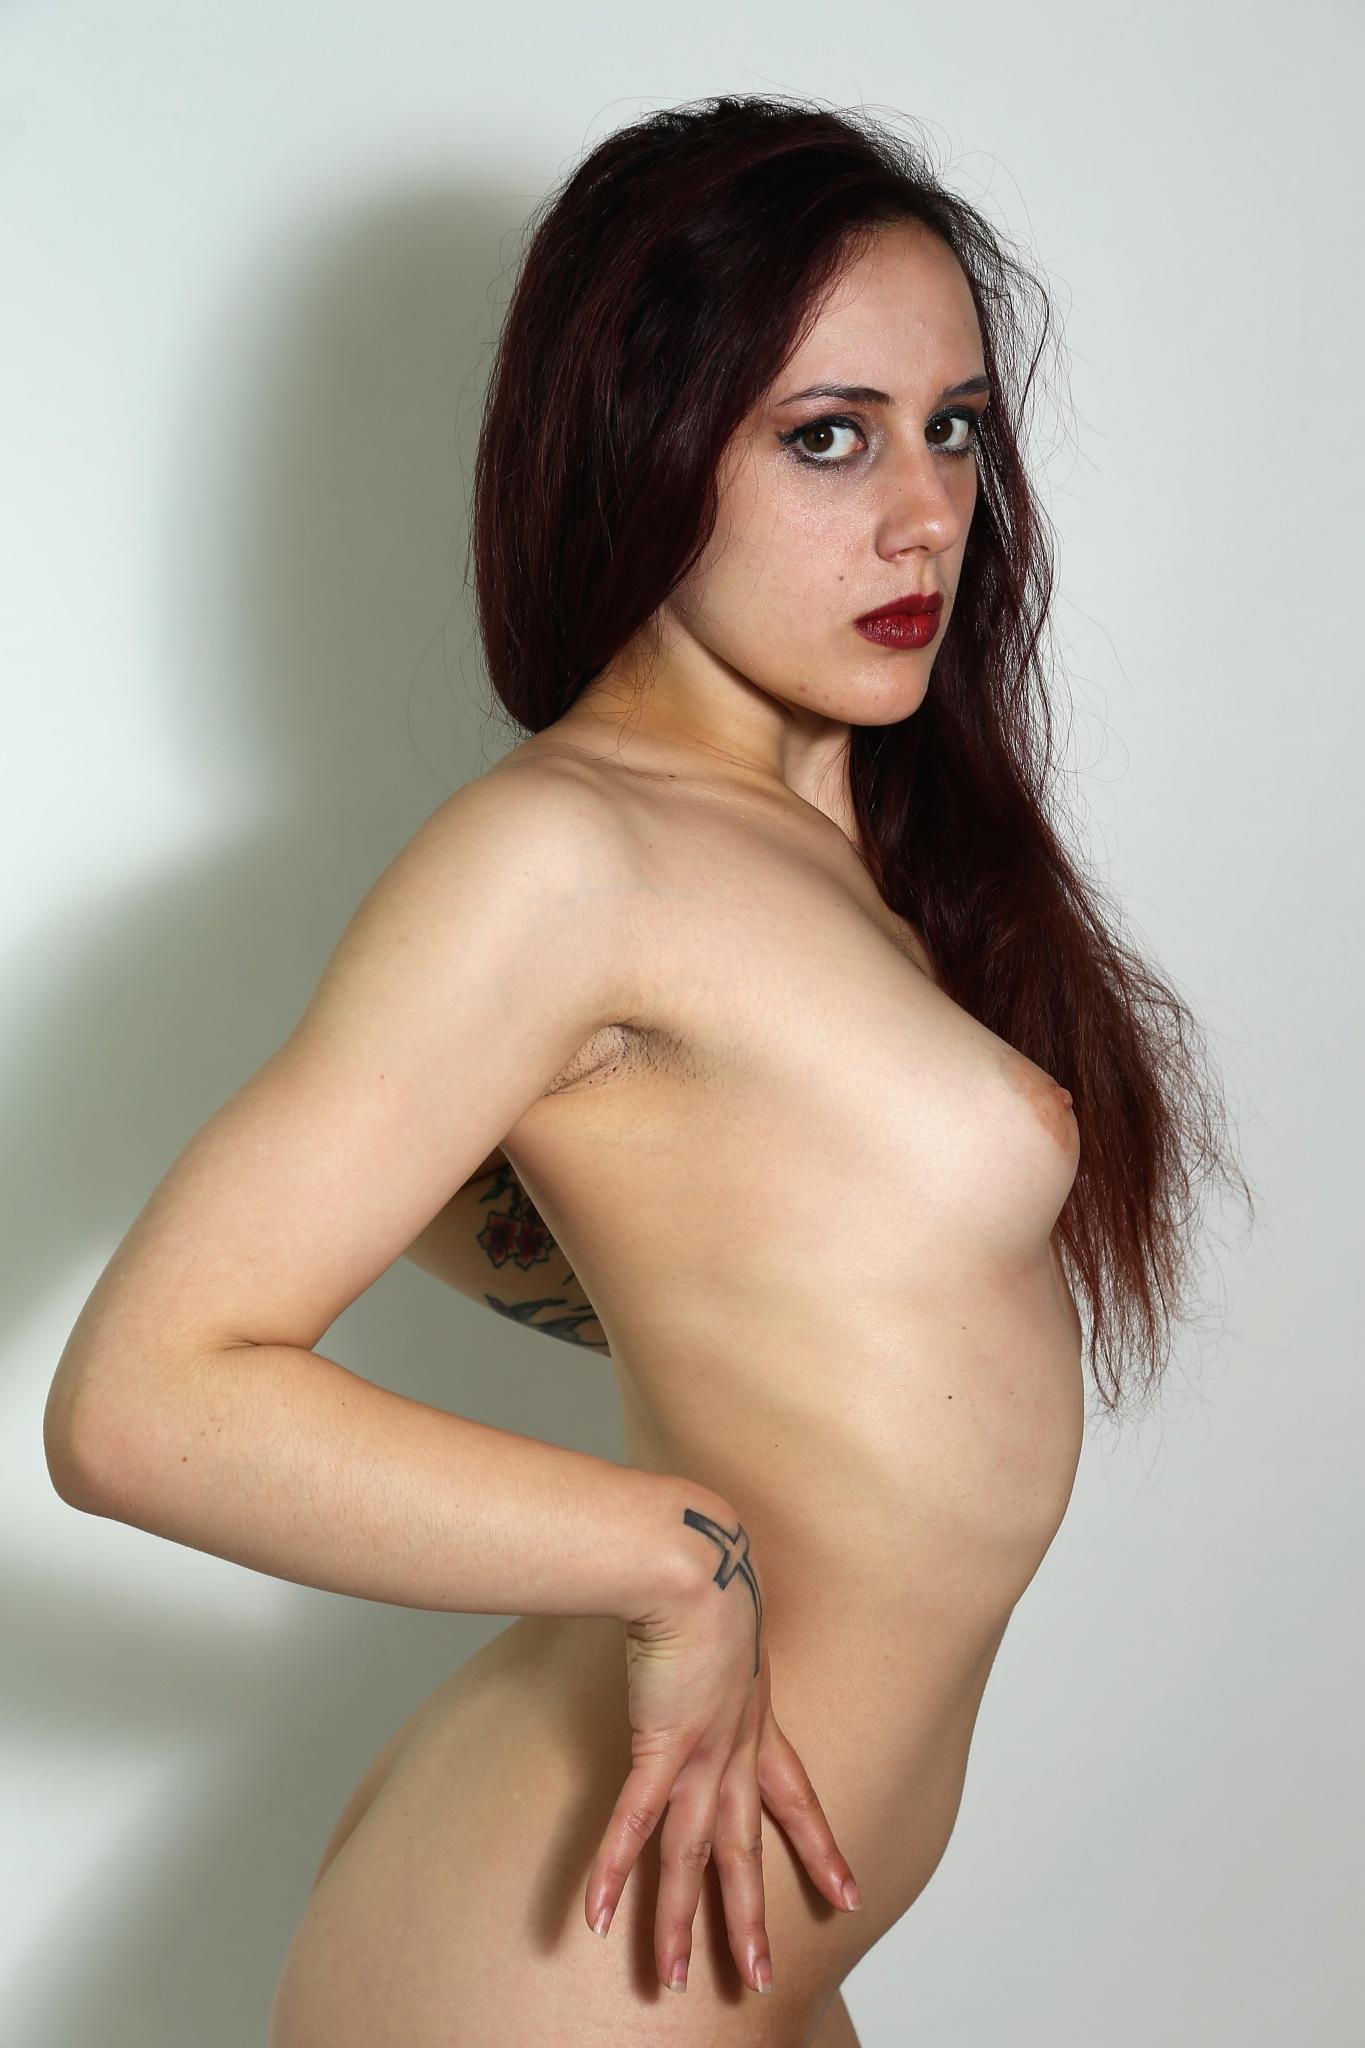 Model by Petehudson